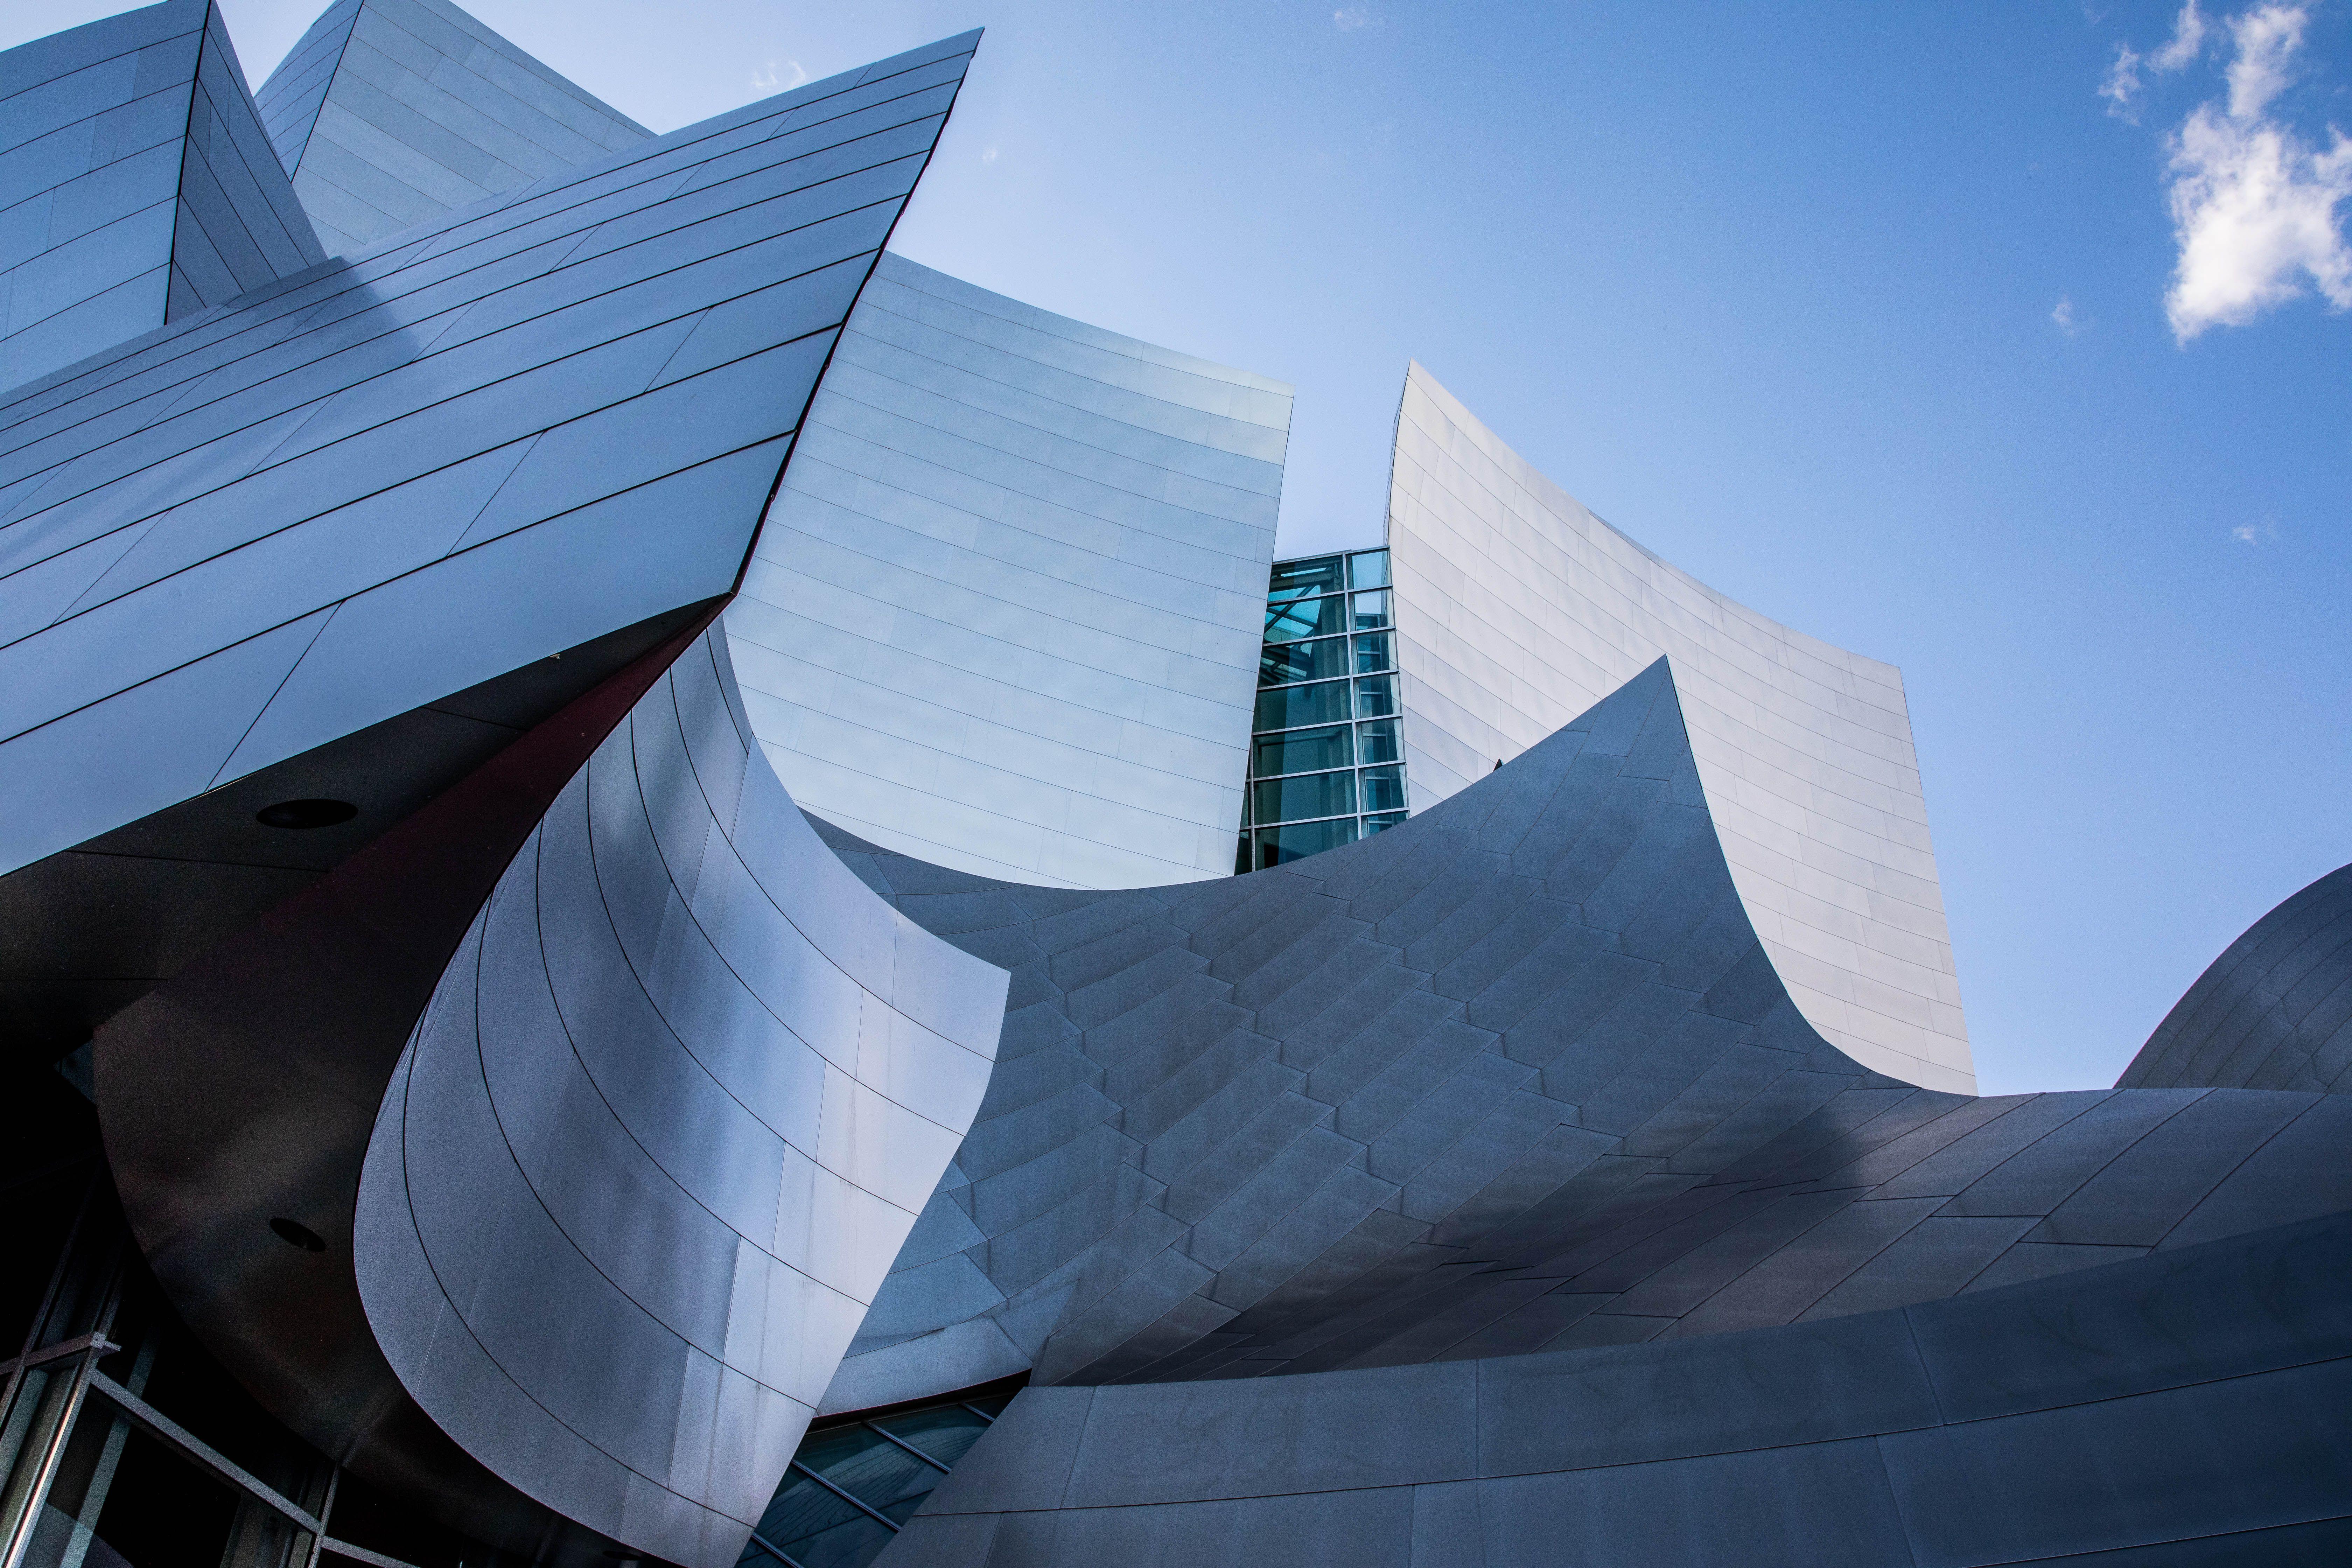 The Disney concert hall